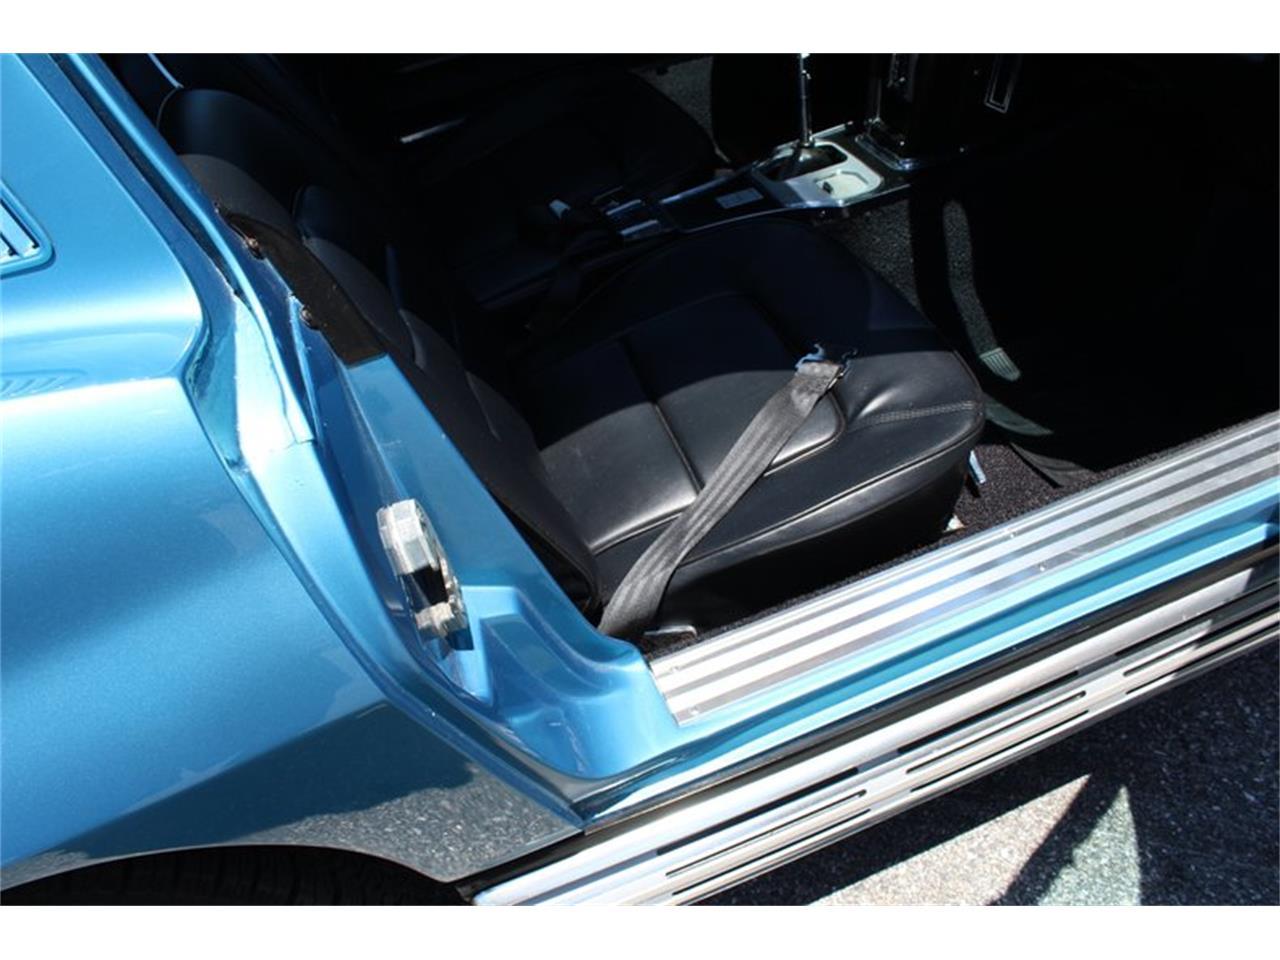 Large Picture of Classic 1965 Corvette located in Florida - $69,500.00 - QSRR